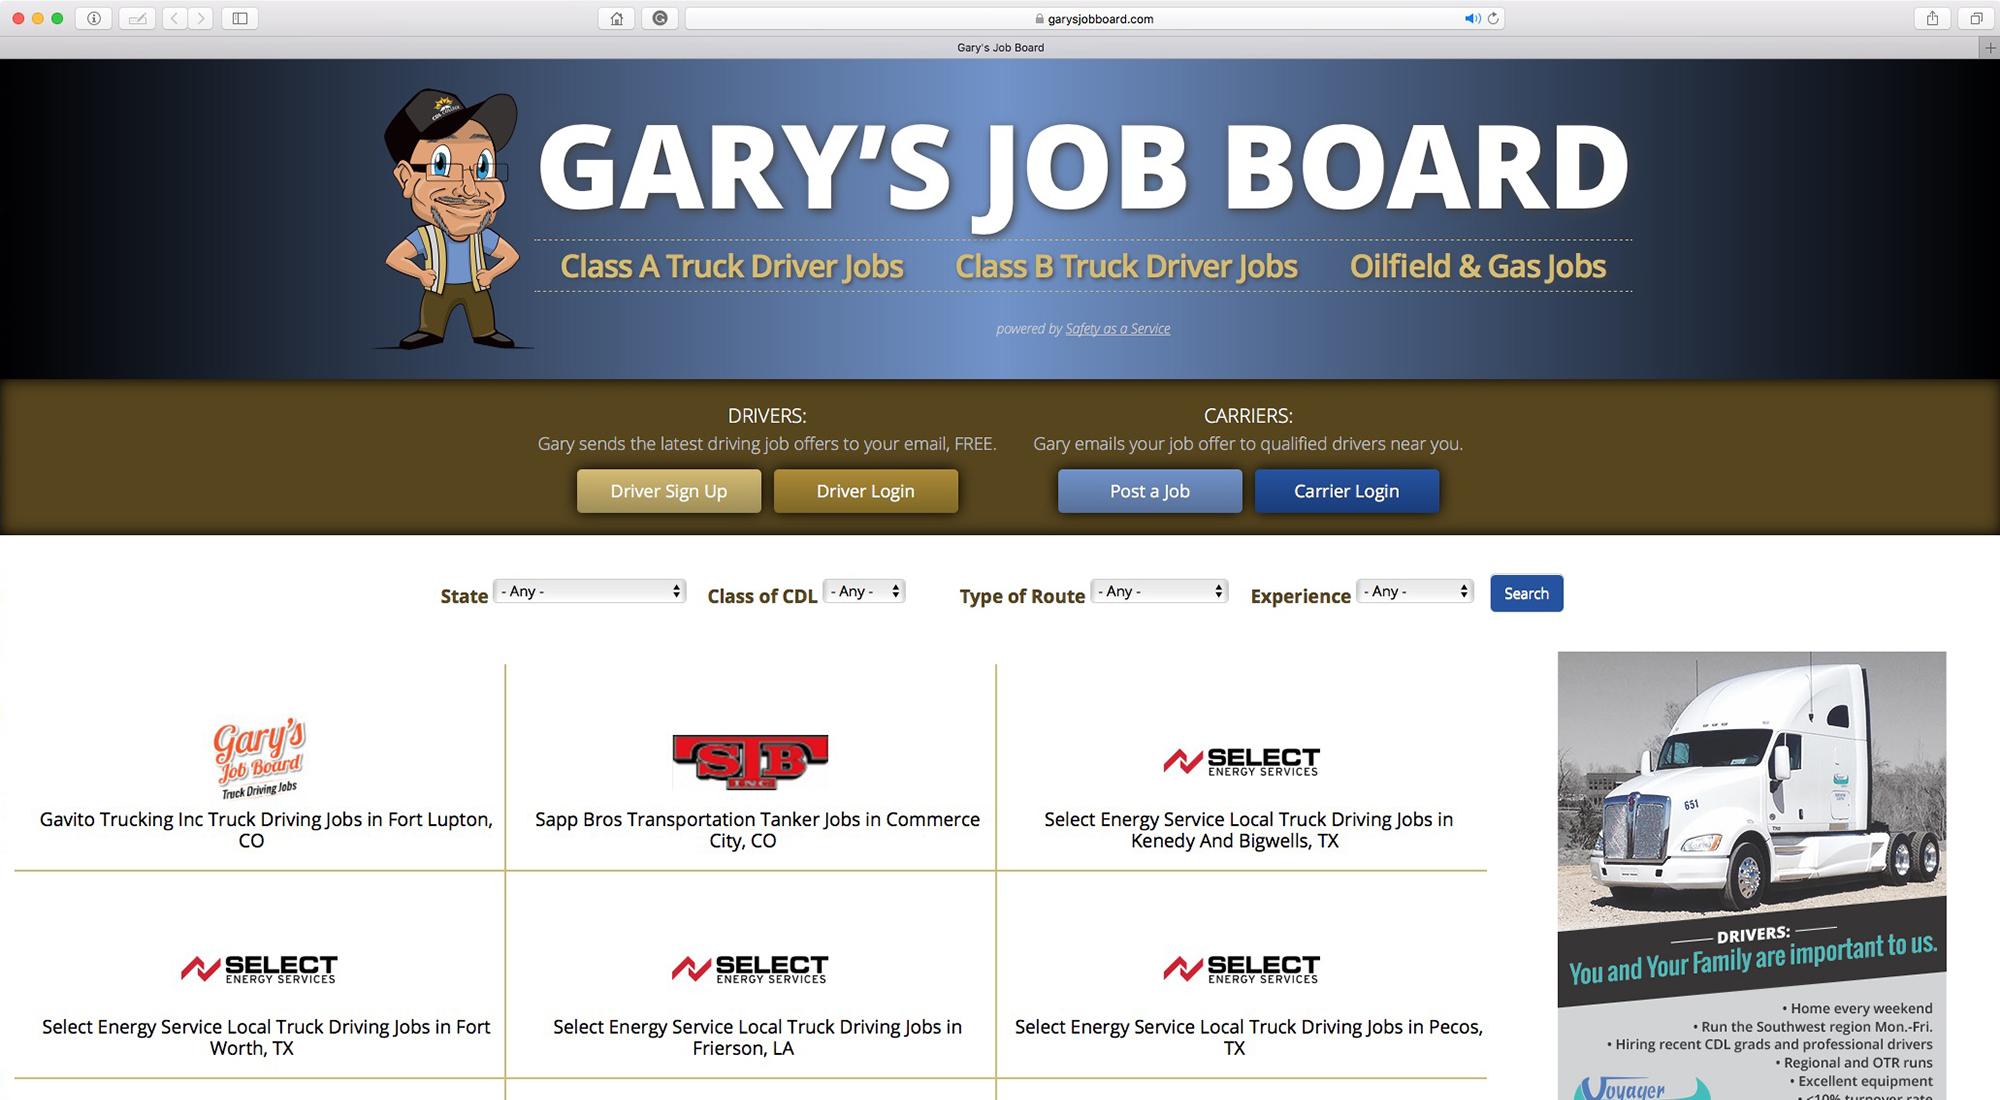 garysjobboard.com homepage